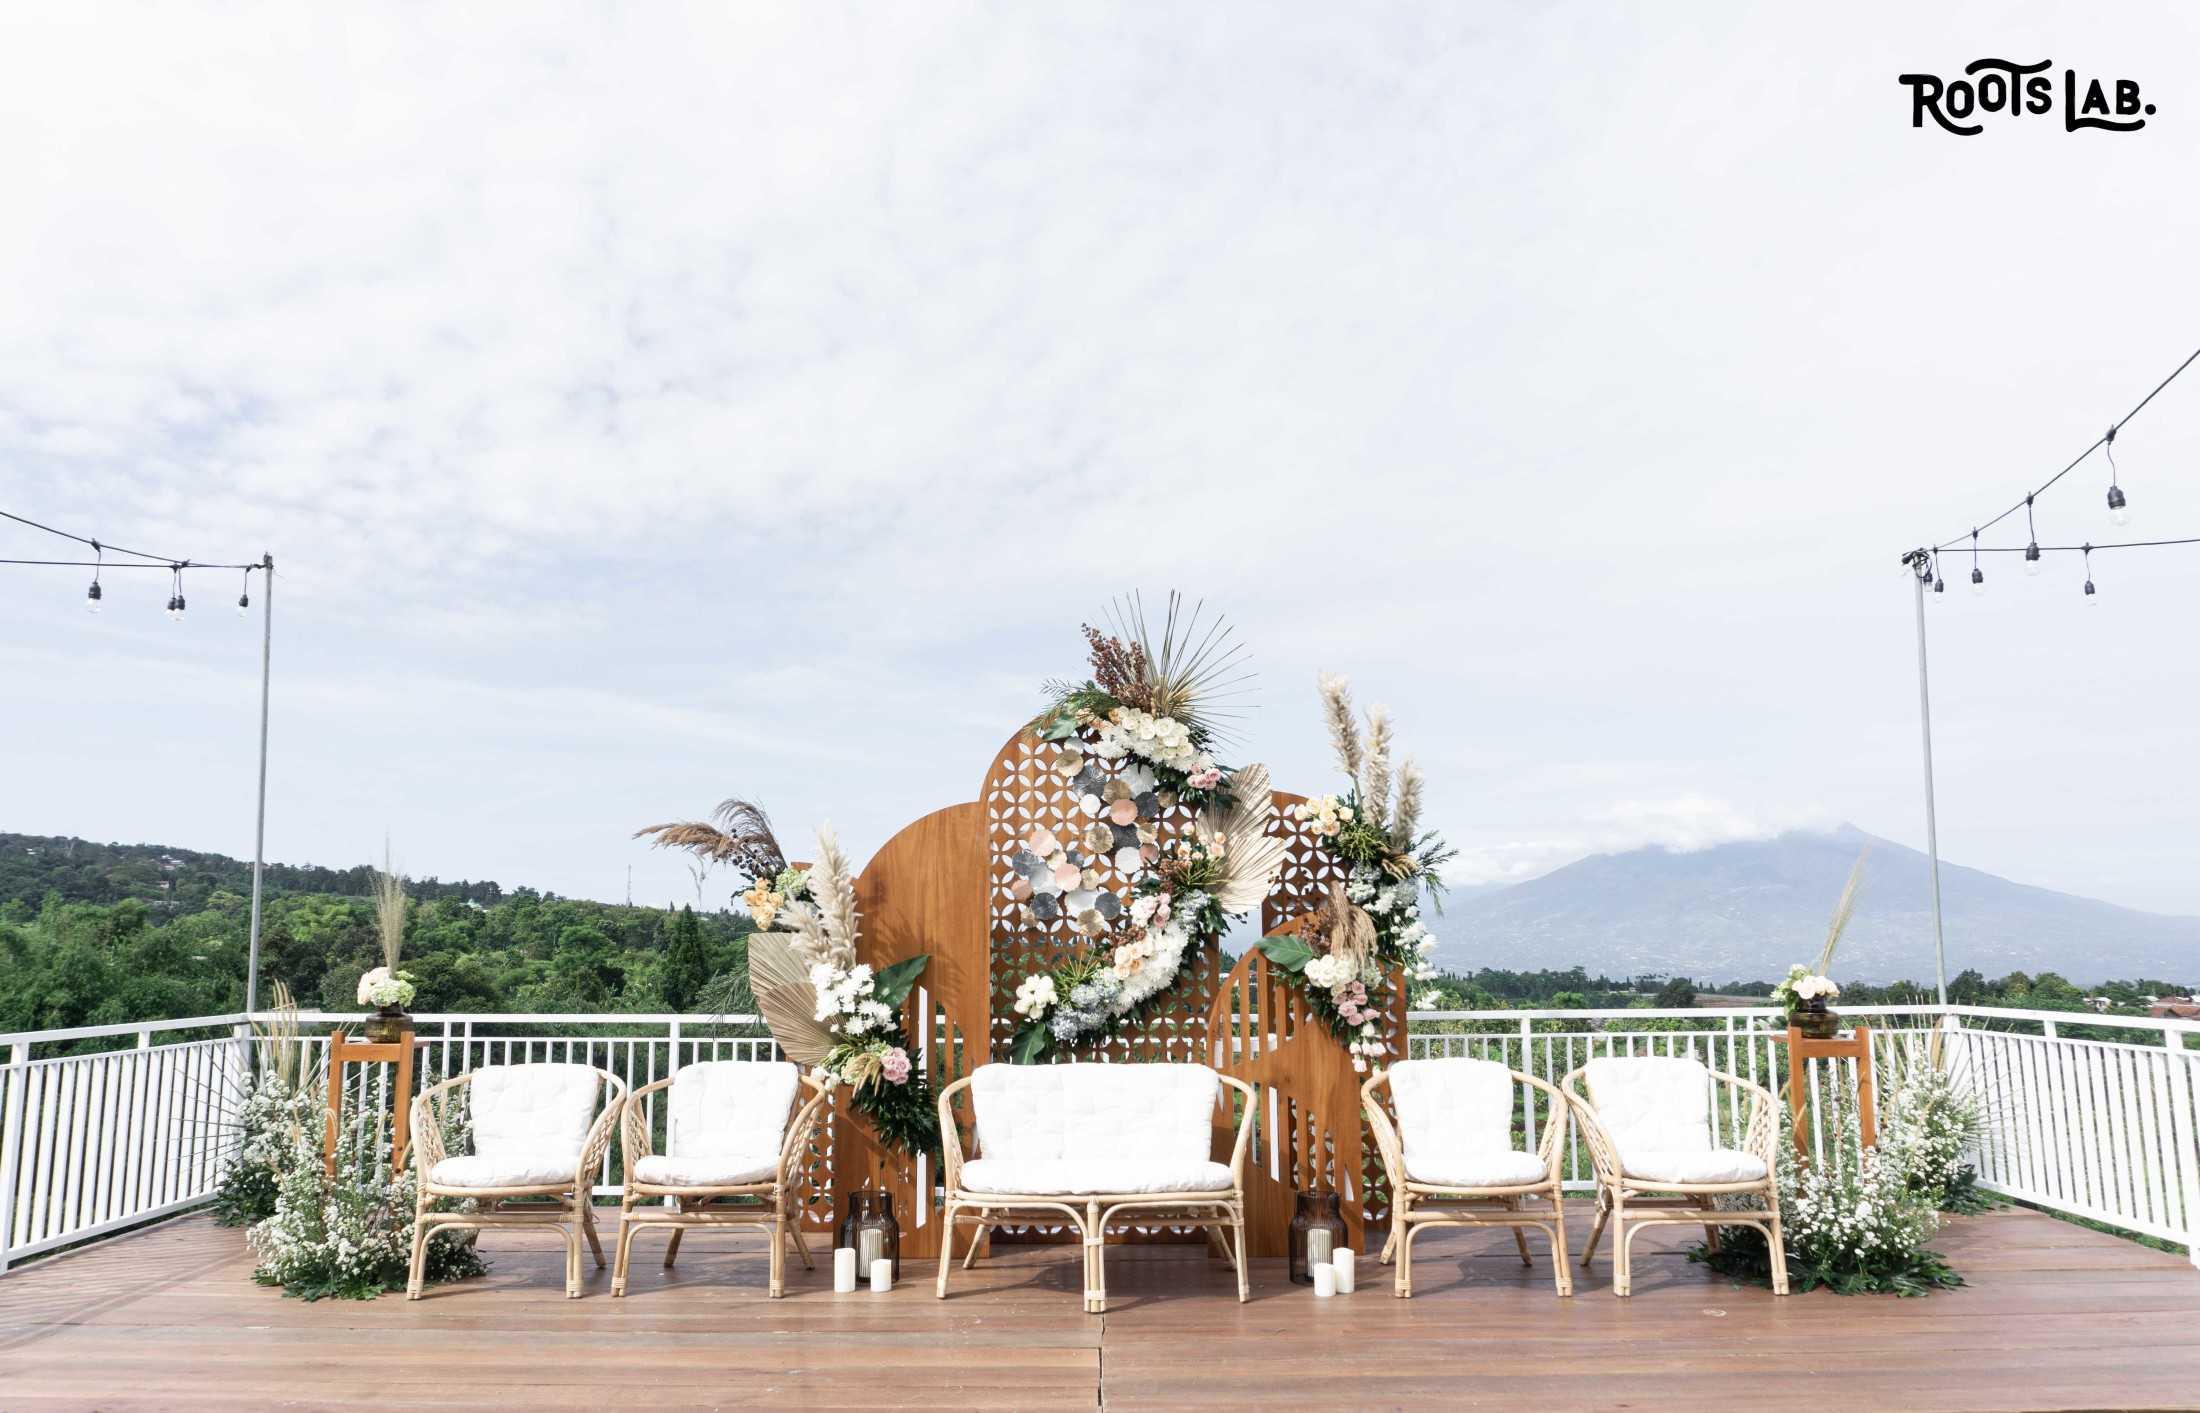 Rootslab Intimate Wedding Venue Villa Akira Megamendung, Kec. Megamendung, Bogor, Jawa Barat, Indonesia Megamendung, Kec. Megamendung, Bogor, Jawa Barat, Indonesia Rootslab-Intimate-Wedding-Venue-Villa-Akira  111417